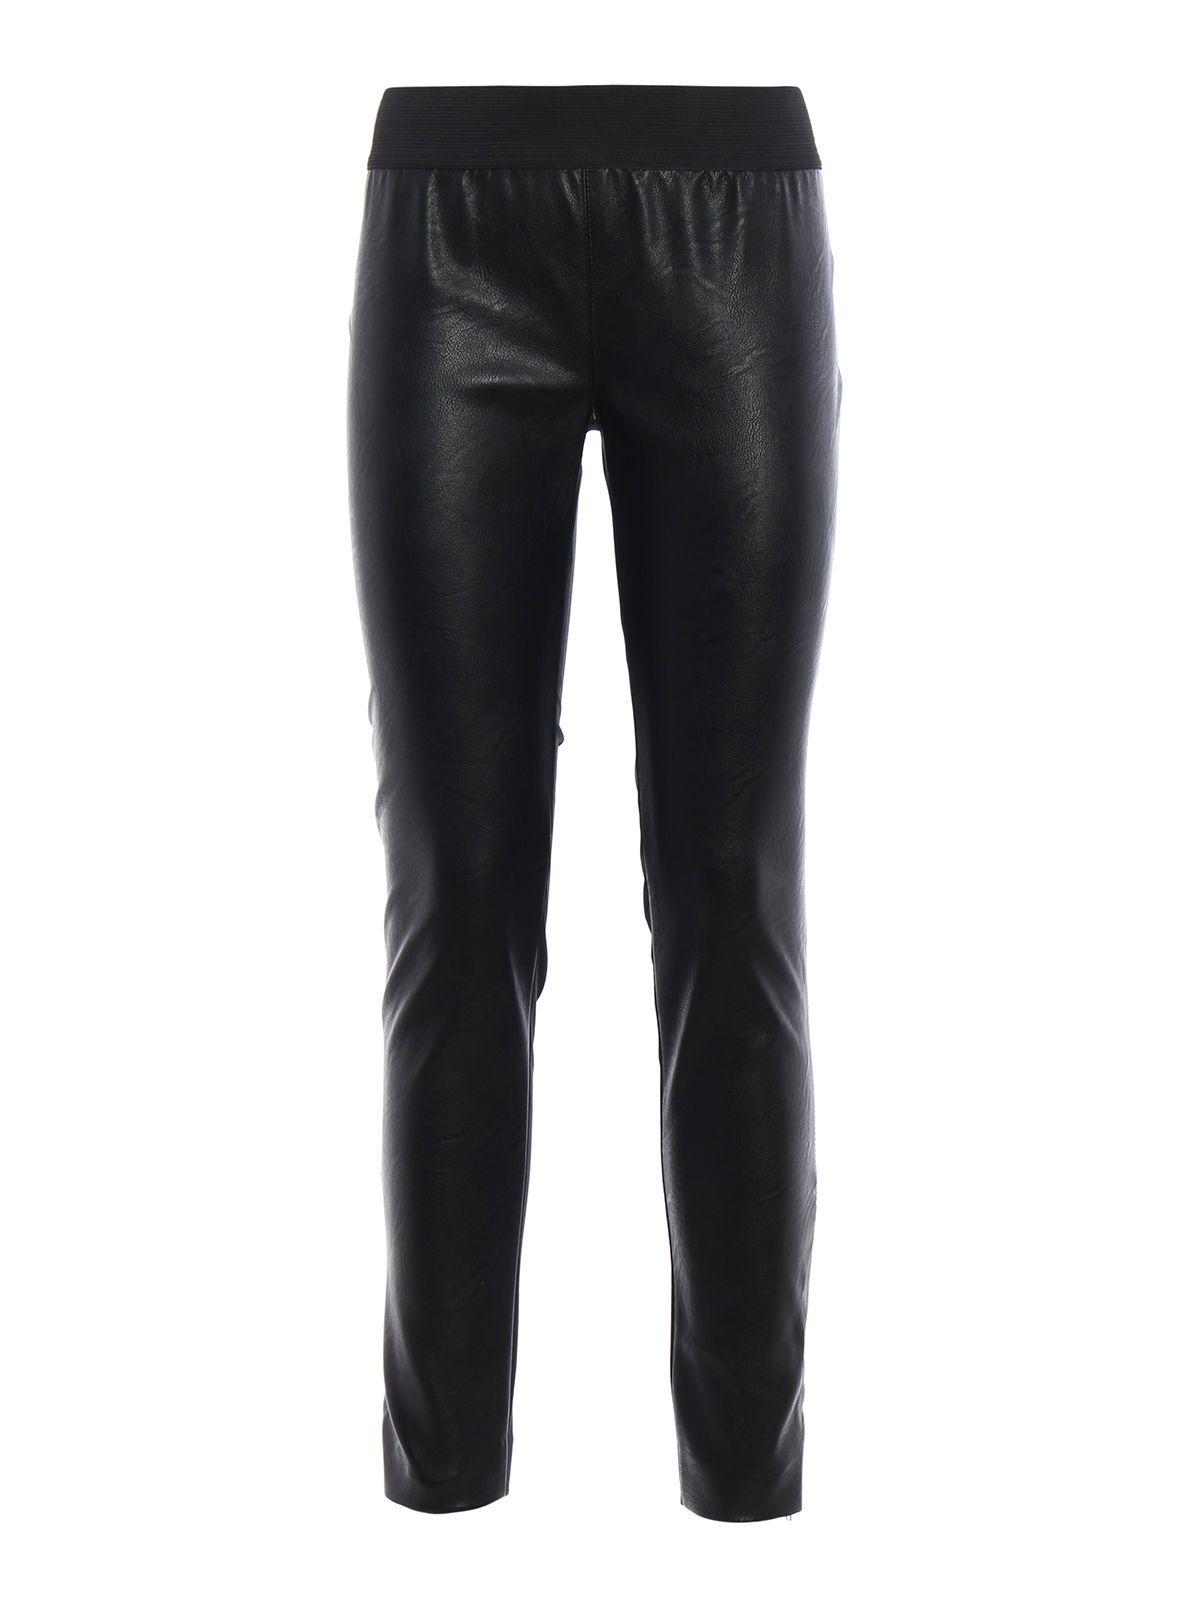 Stella McCartney Darcelle Trousers